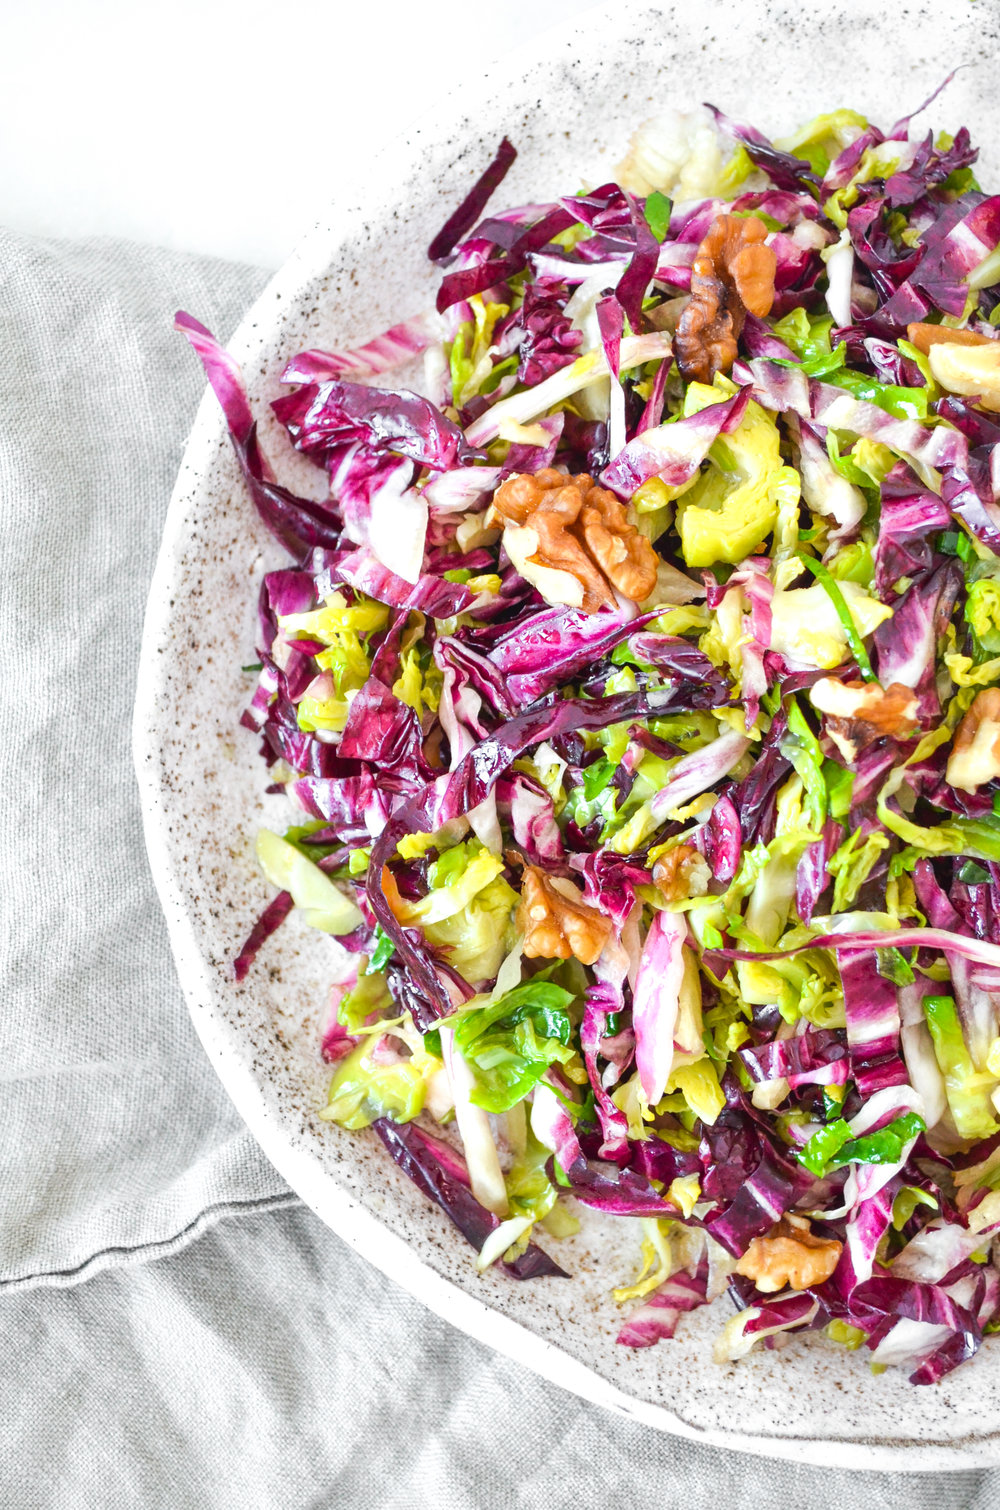 brussels sprouts salad // #ShiraRD #paleo #refinedsugarfree #SnacksbyShira